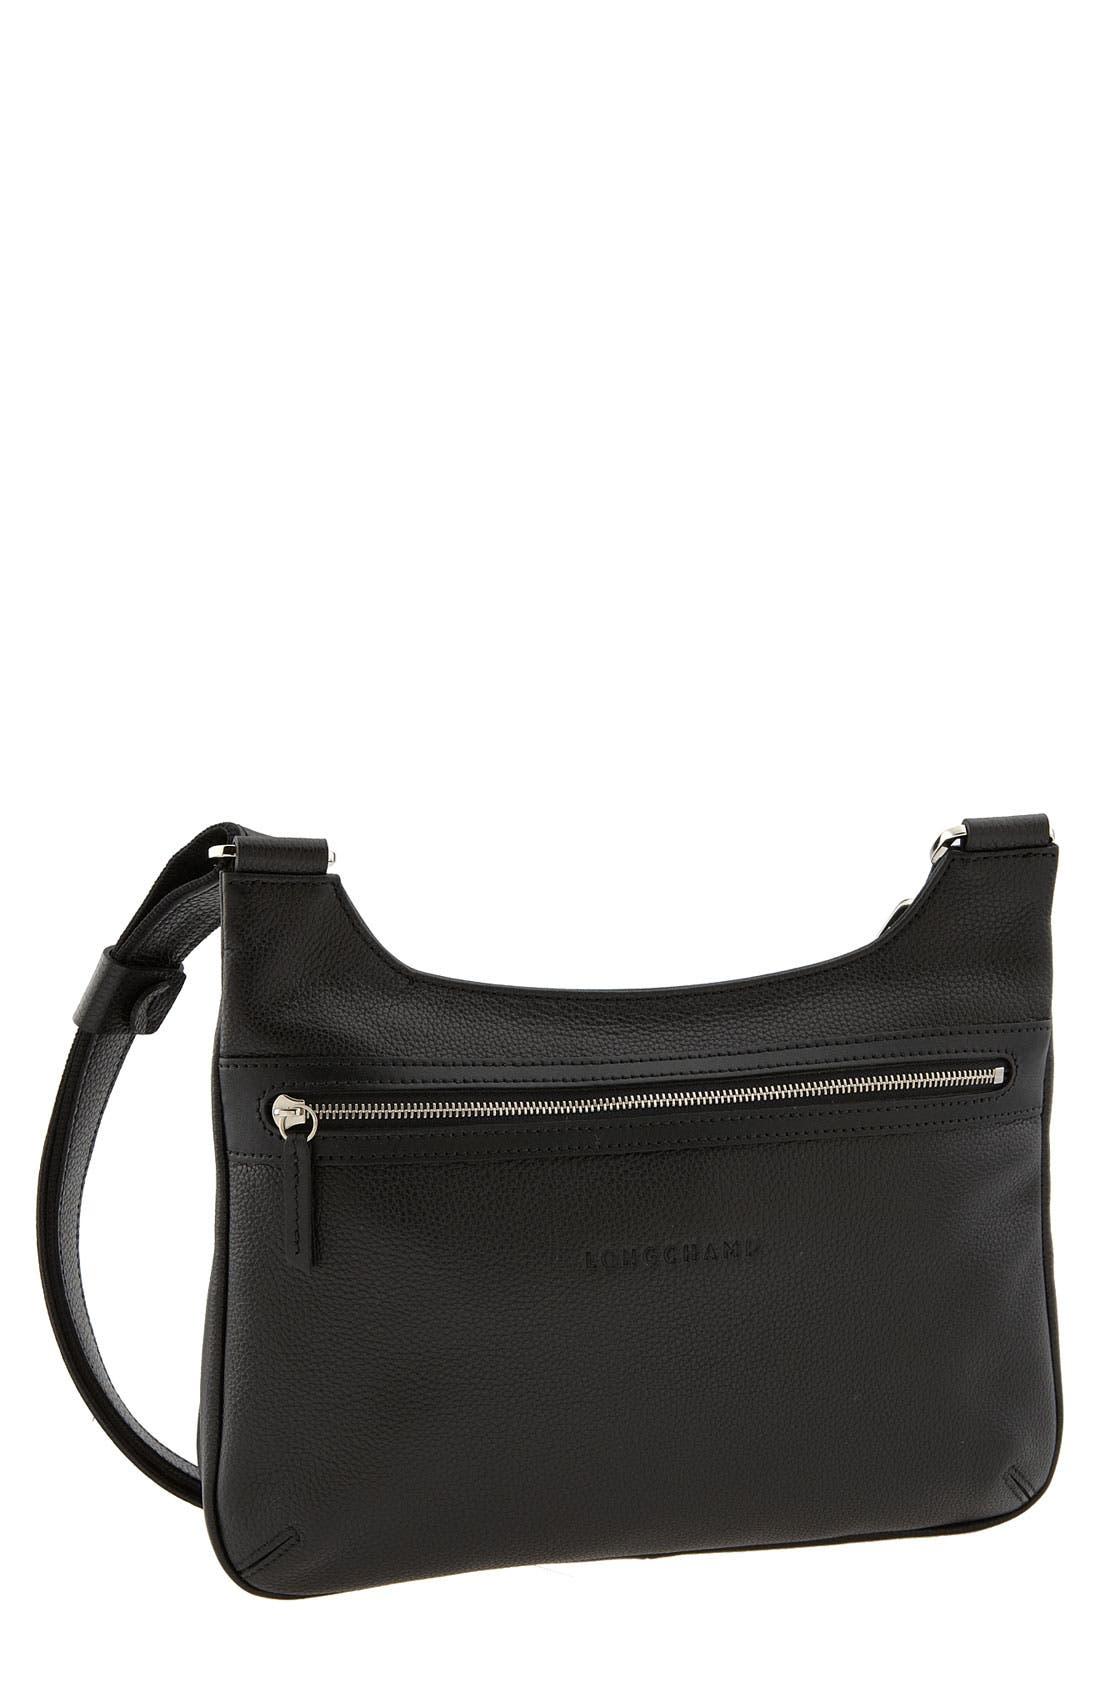 'Veau Foulonne' Crossbody Bag, Main, color, 002